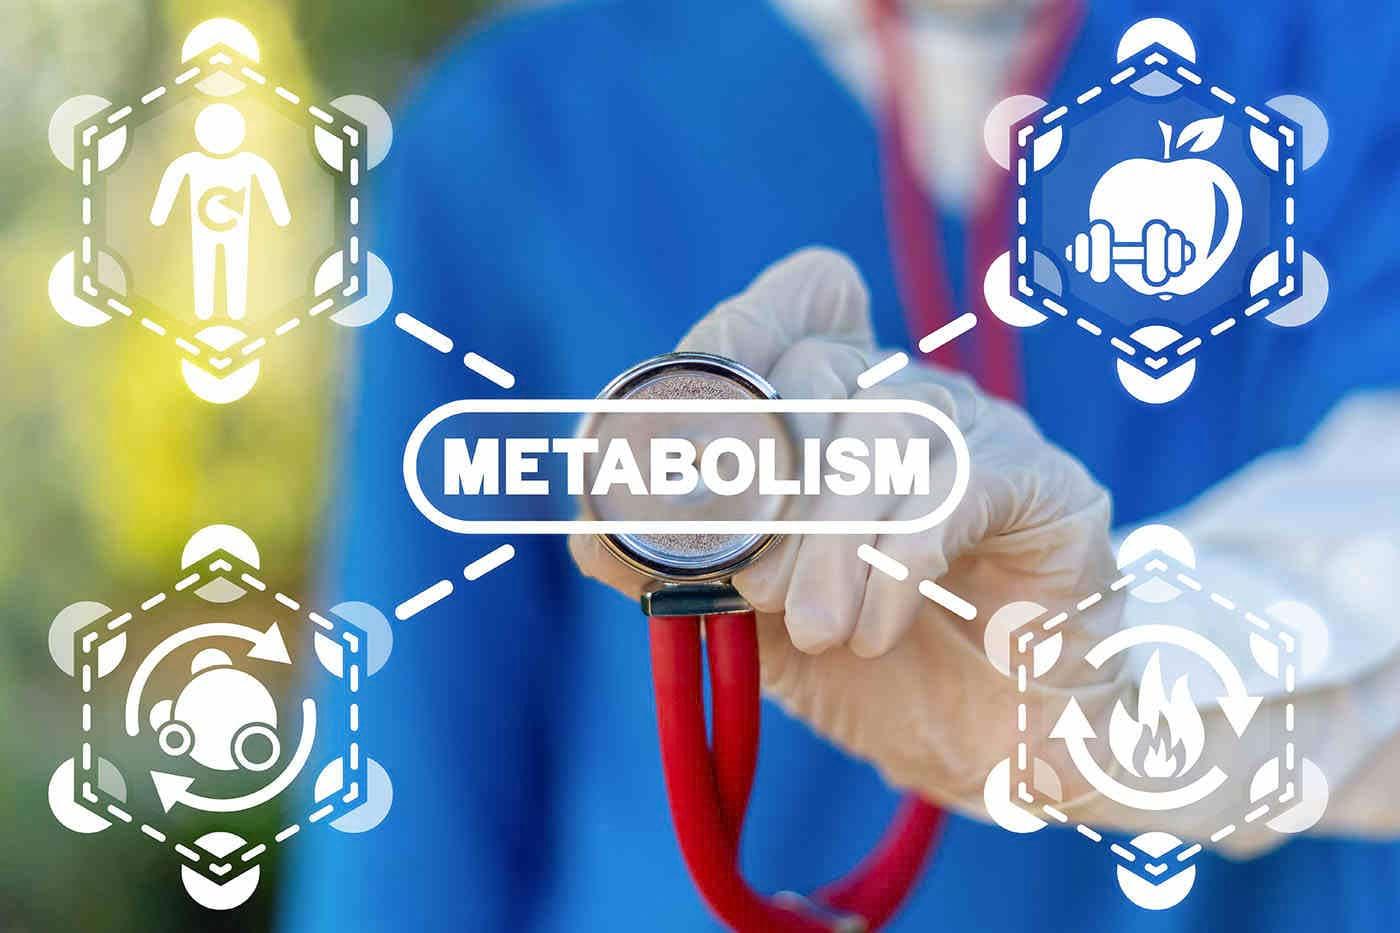 Sindromul metabolic apare tot mai des la tineri